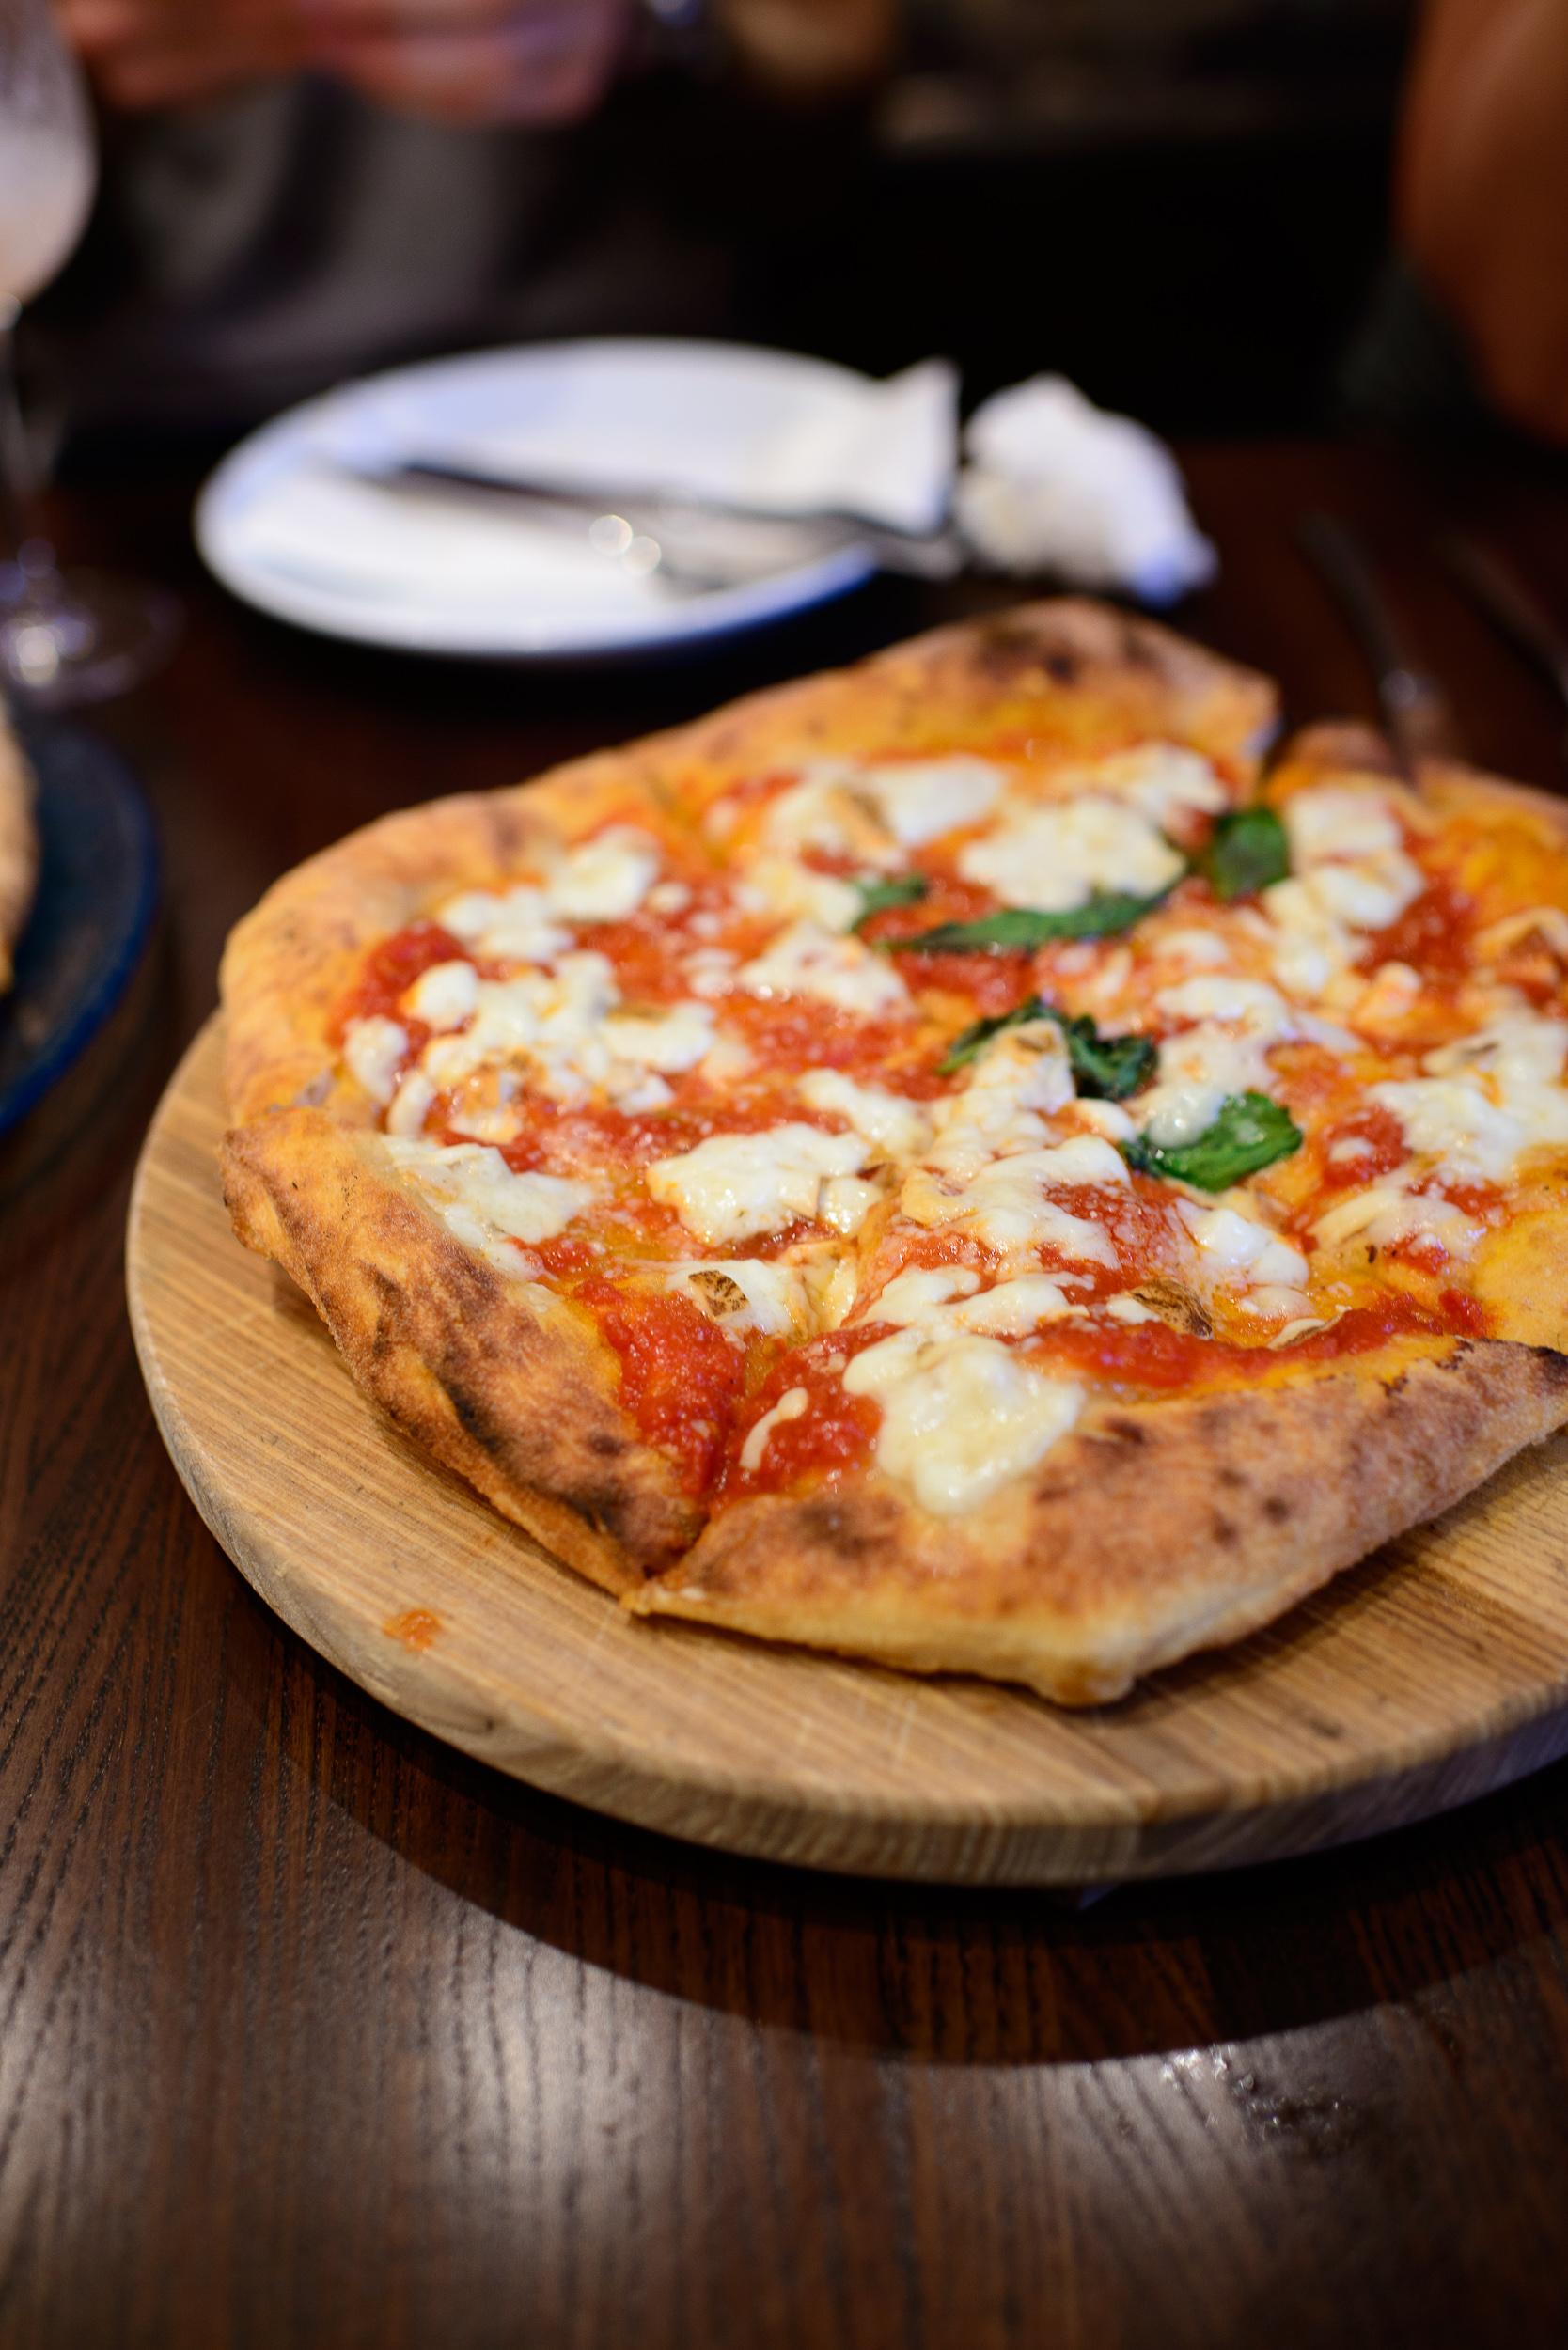 Pizza montanara (deep-fried pizza)